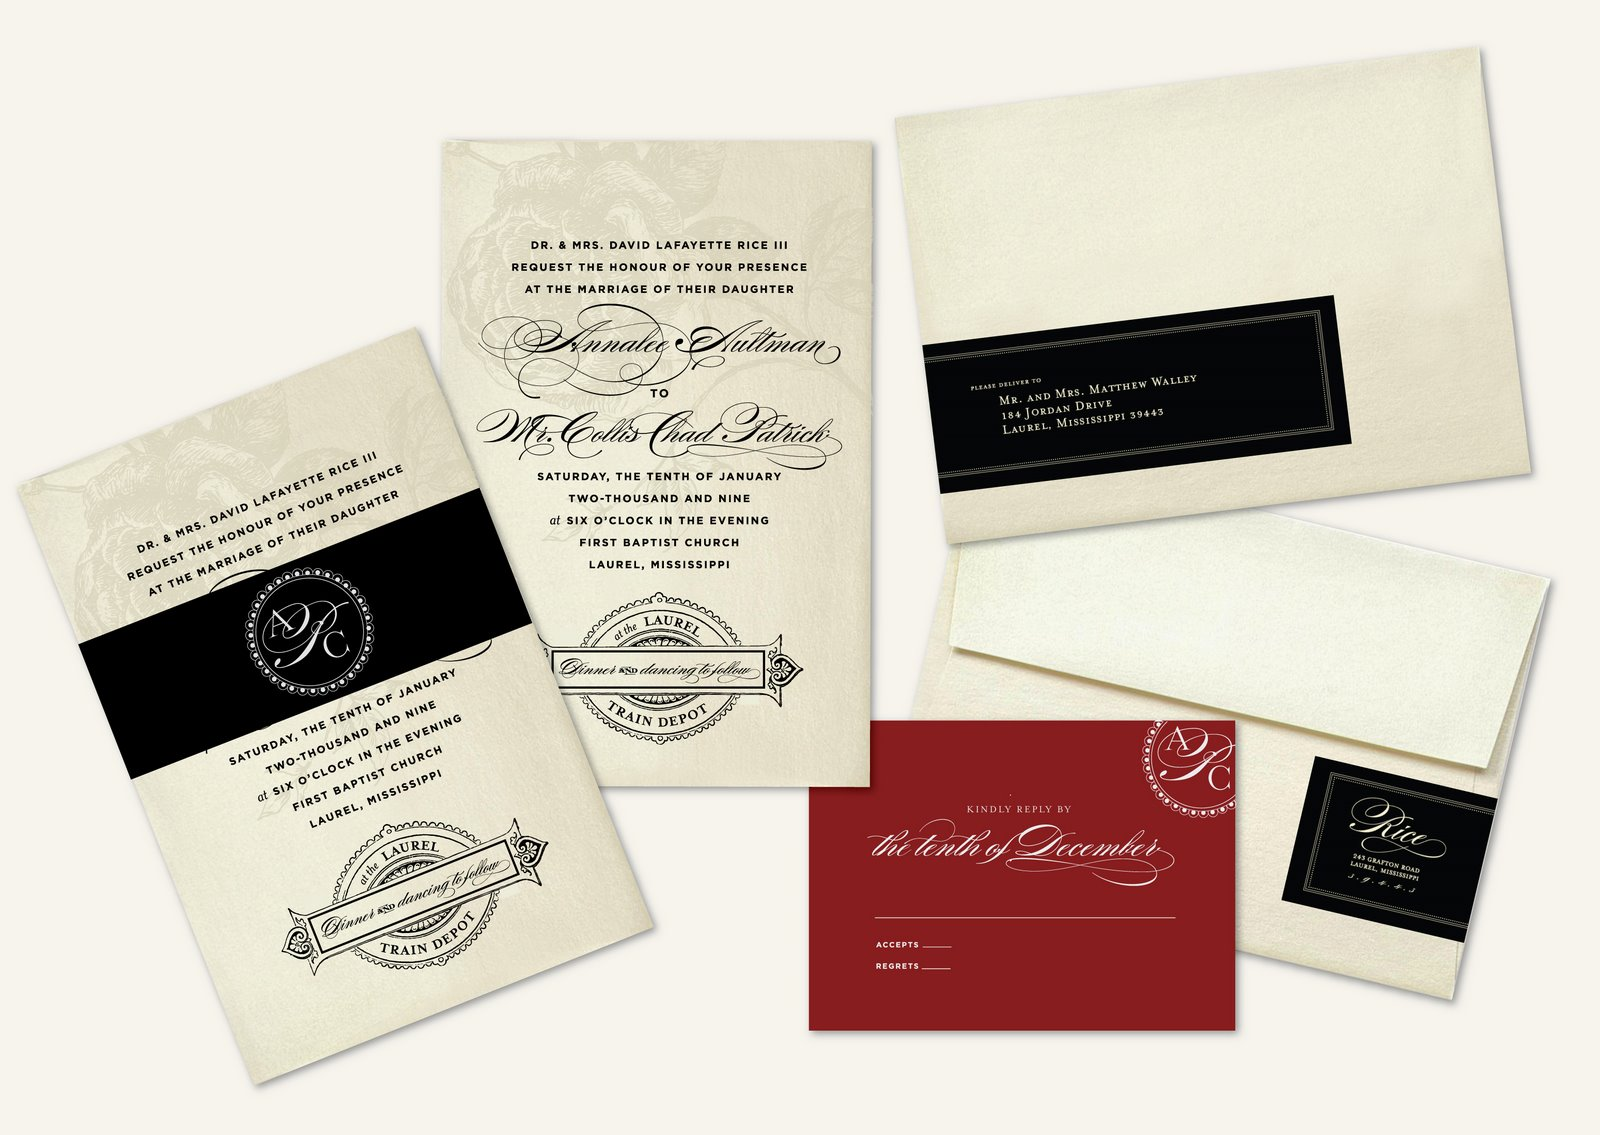 Rice/Patrick Wedding | Lucky Luxe Couture Correspondence ...